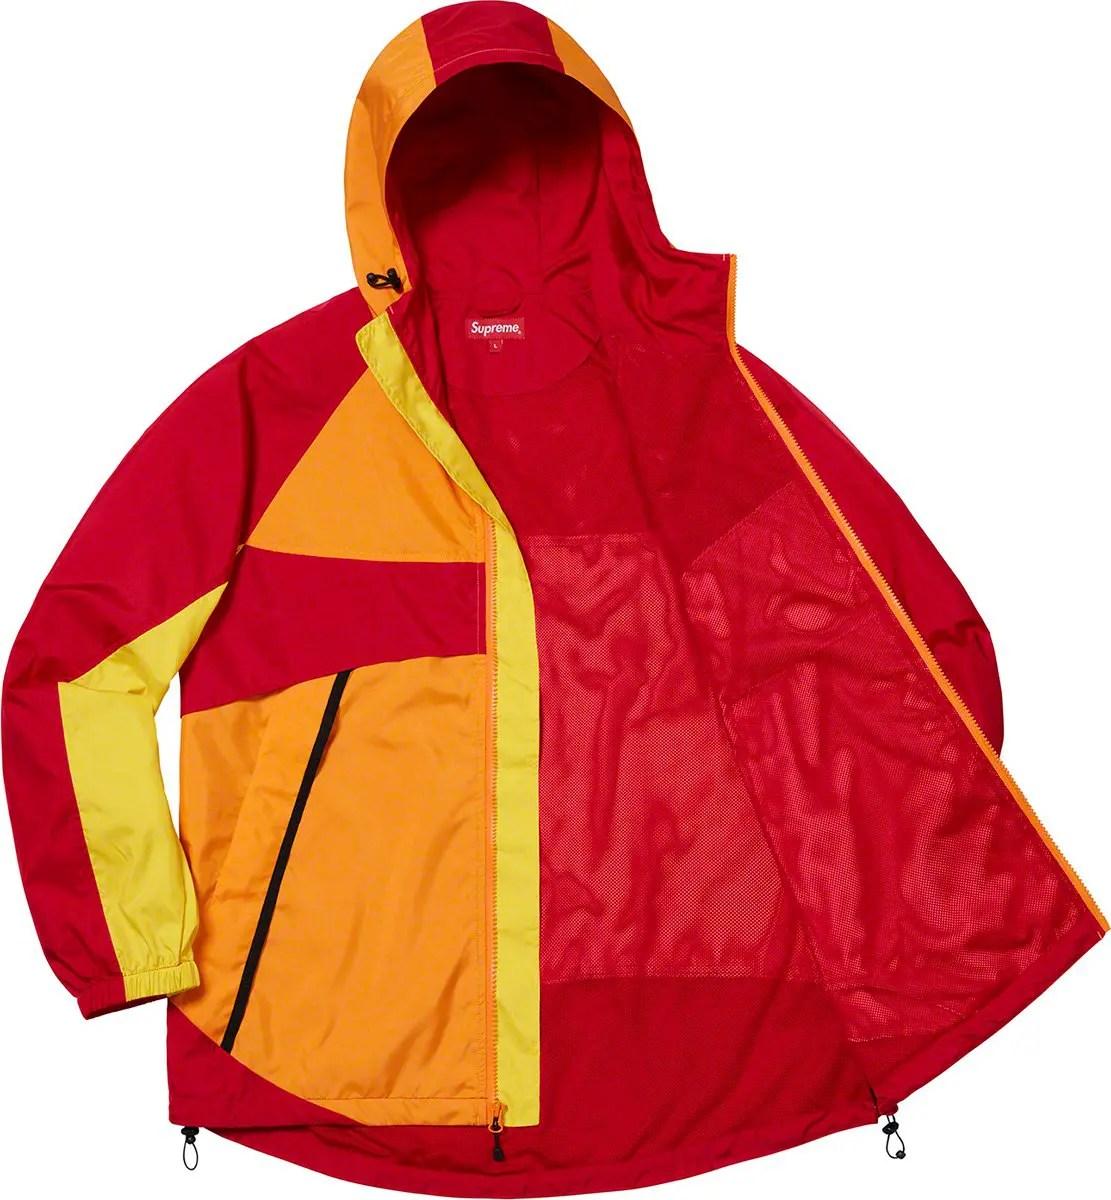 supreme-19ss-spring-summer-paneled-hooded-windbreaker-02